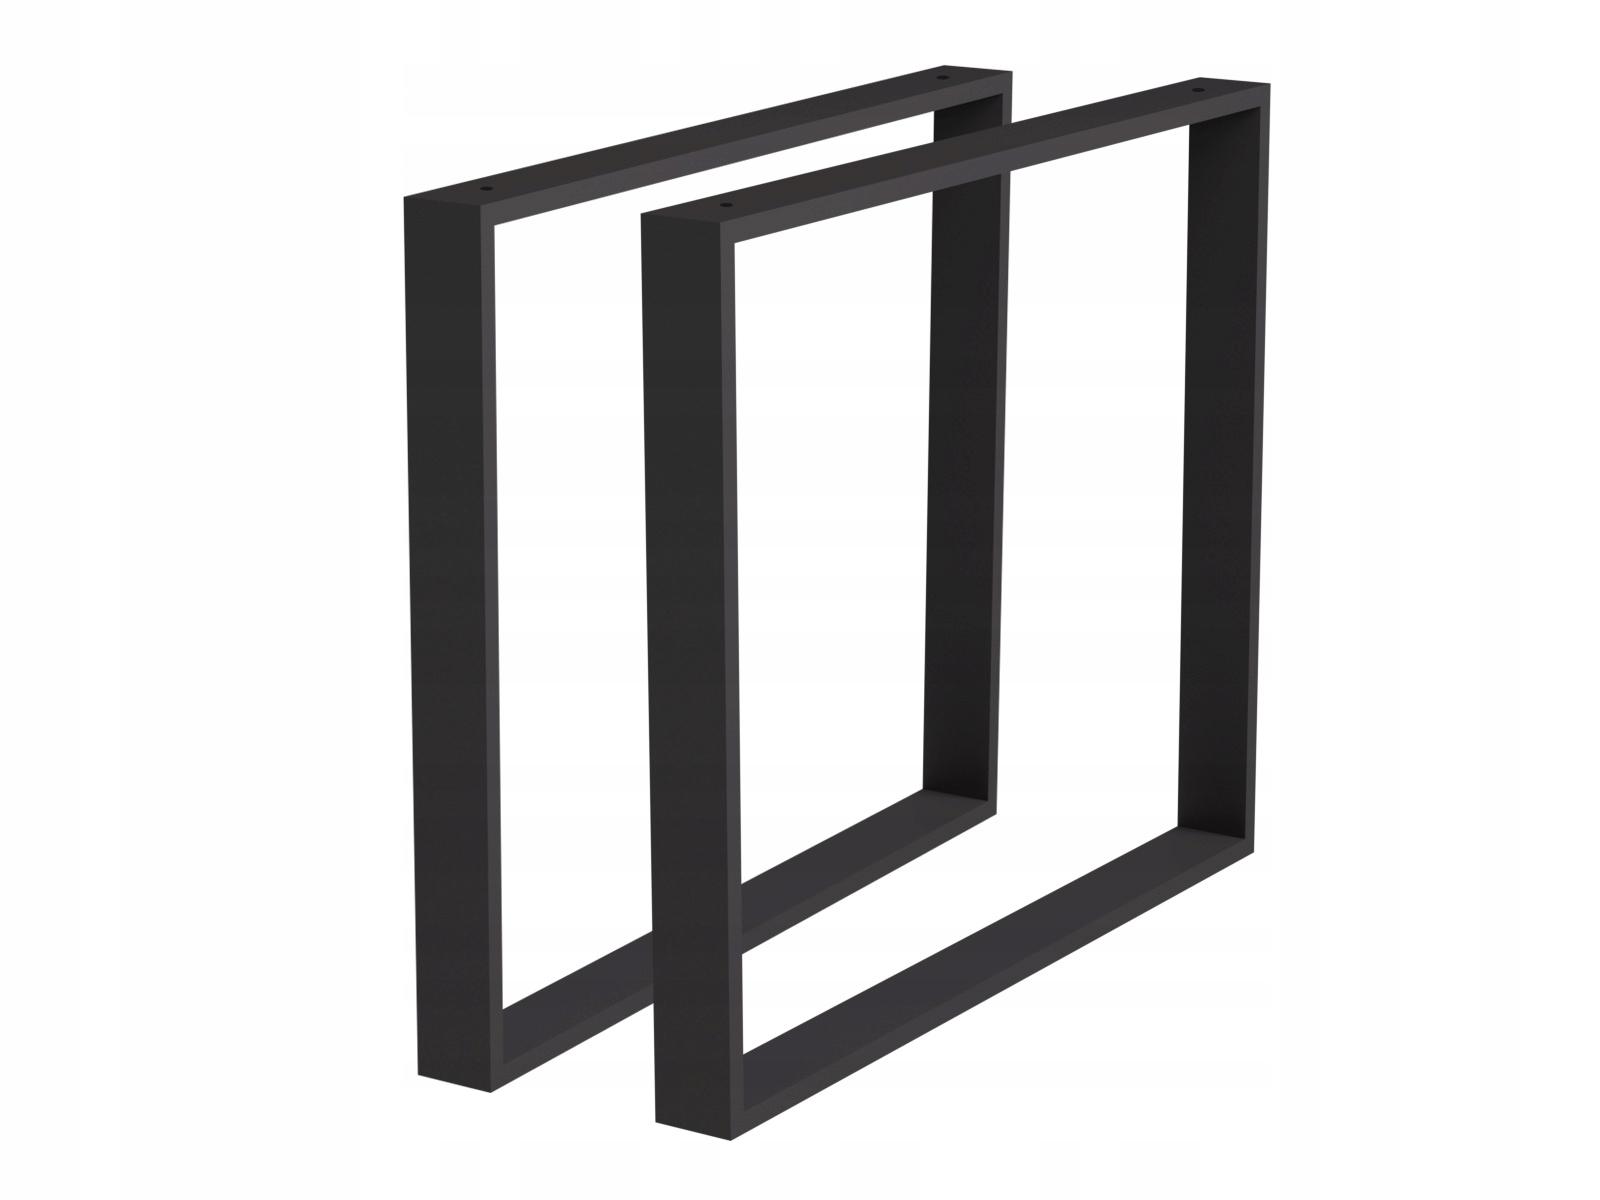 2 LOFT TABLE LEGS BLACK ALU BASE 590x710 mm